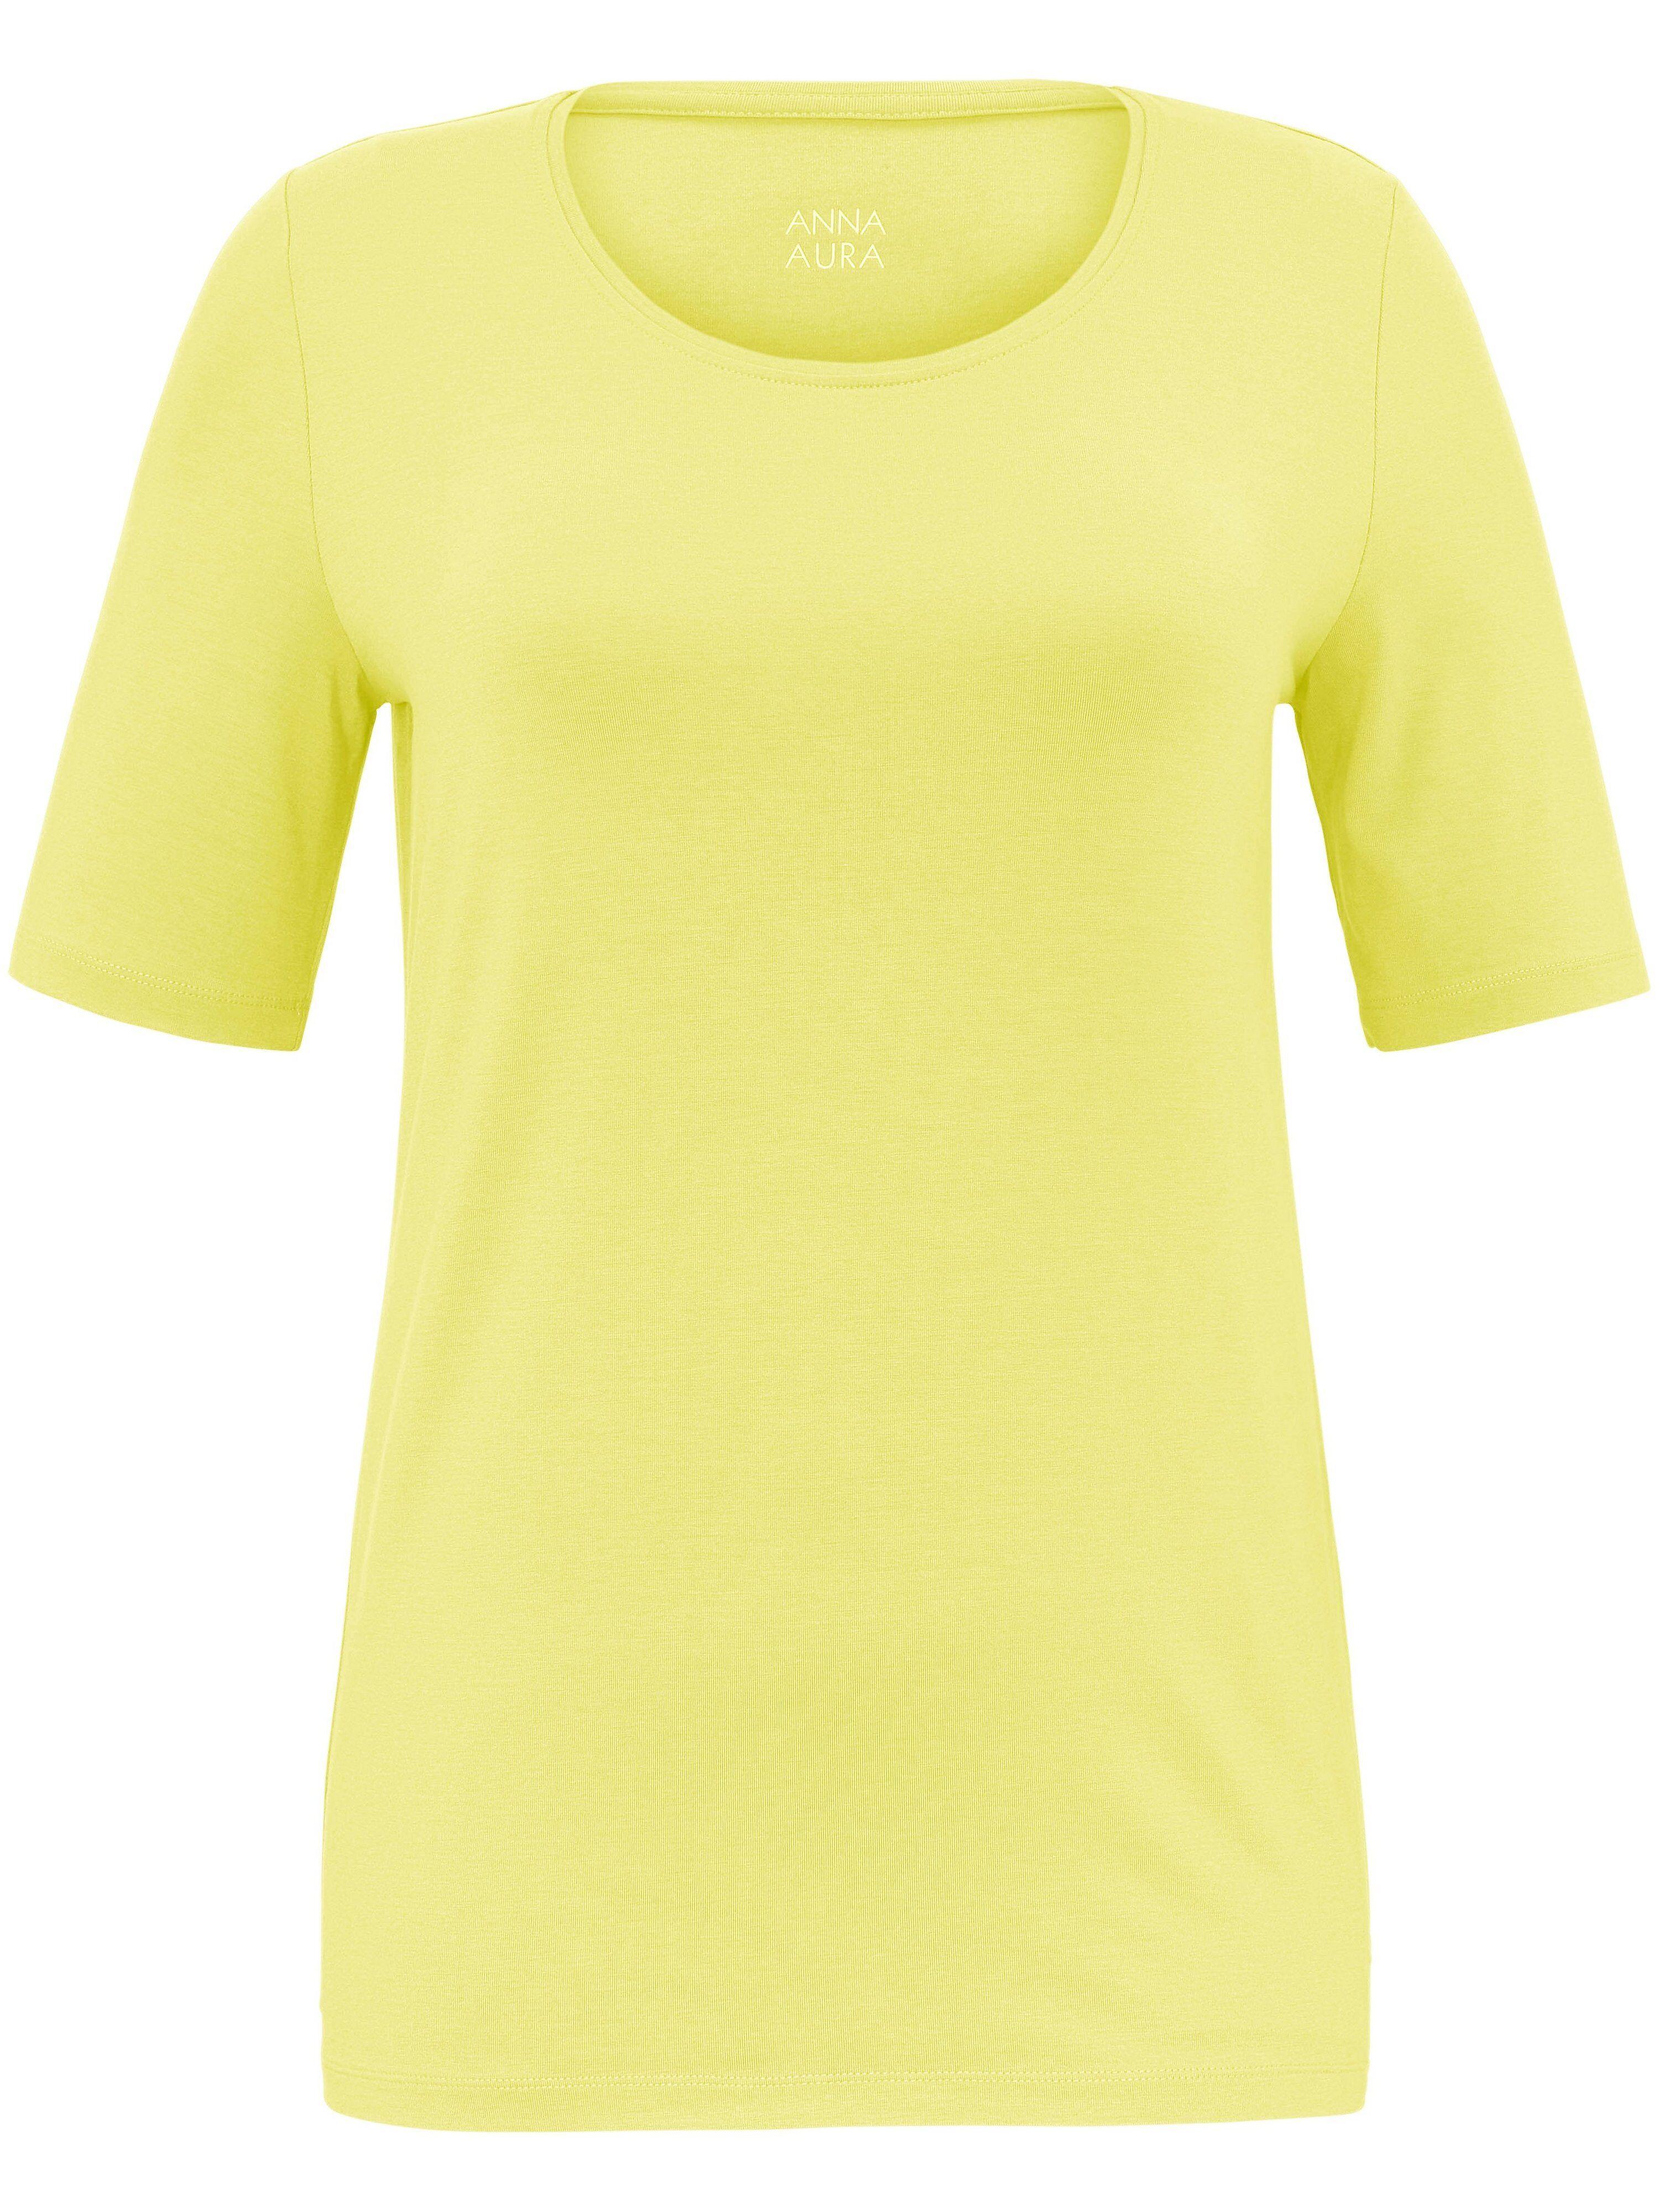 Anna Aura Le T-shirt facile d'entretien  Anna Aura jaune  - Femme - 50